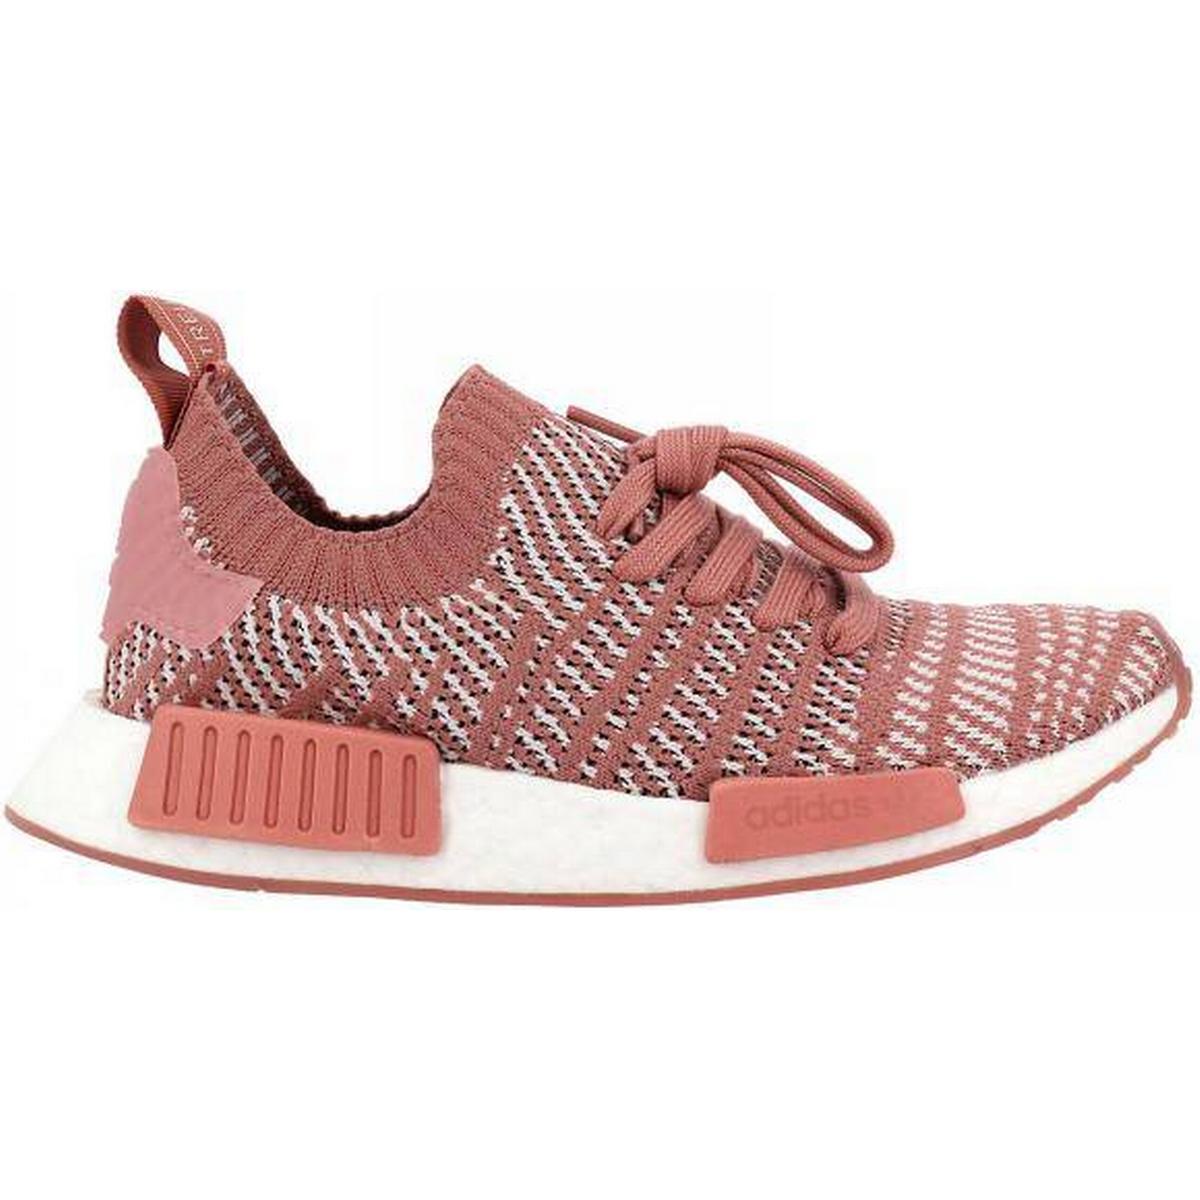 Adidas nmd dam • Hitta det lägsta priset hos PriceRunner nu »